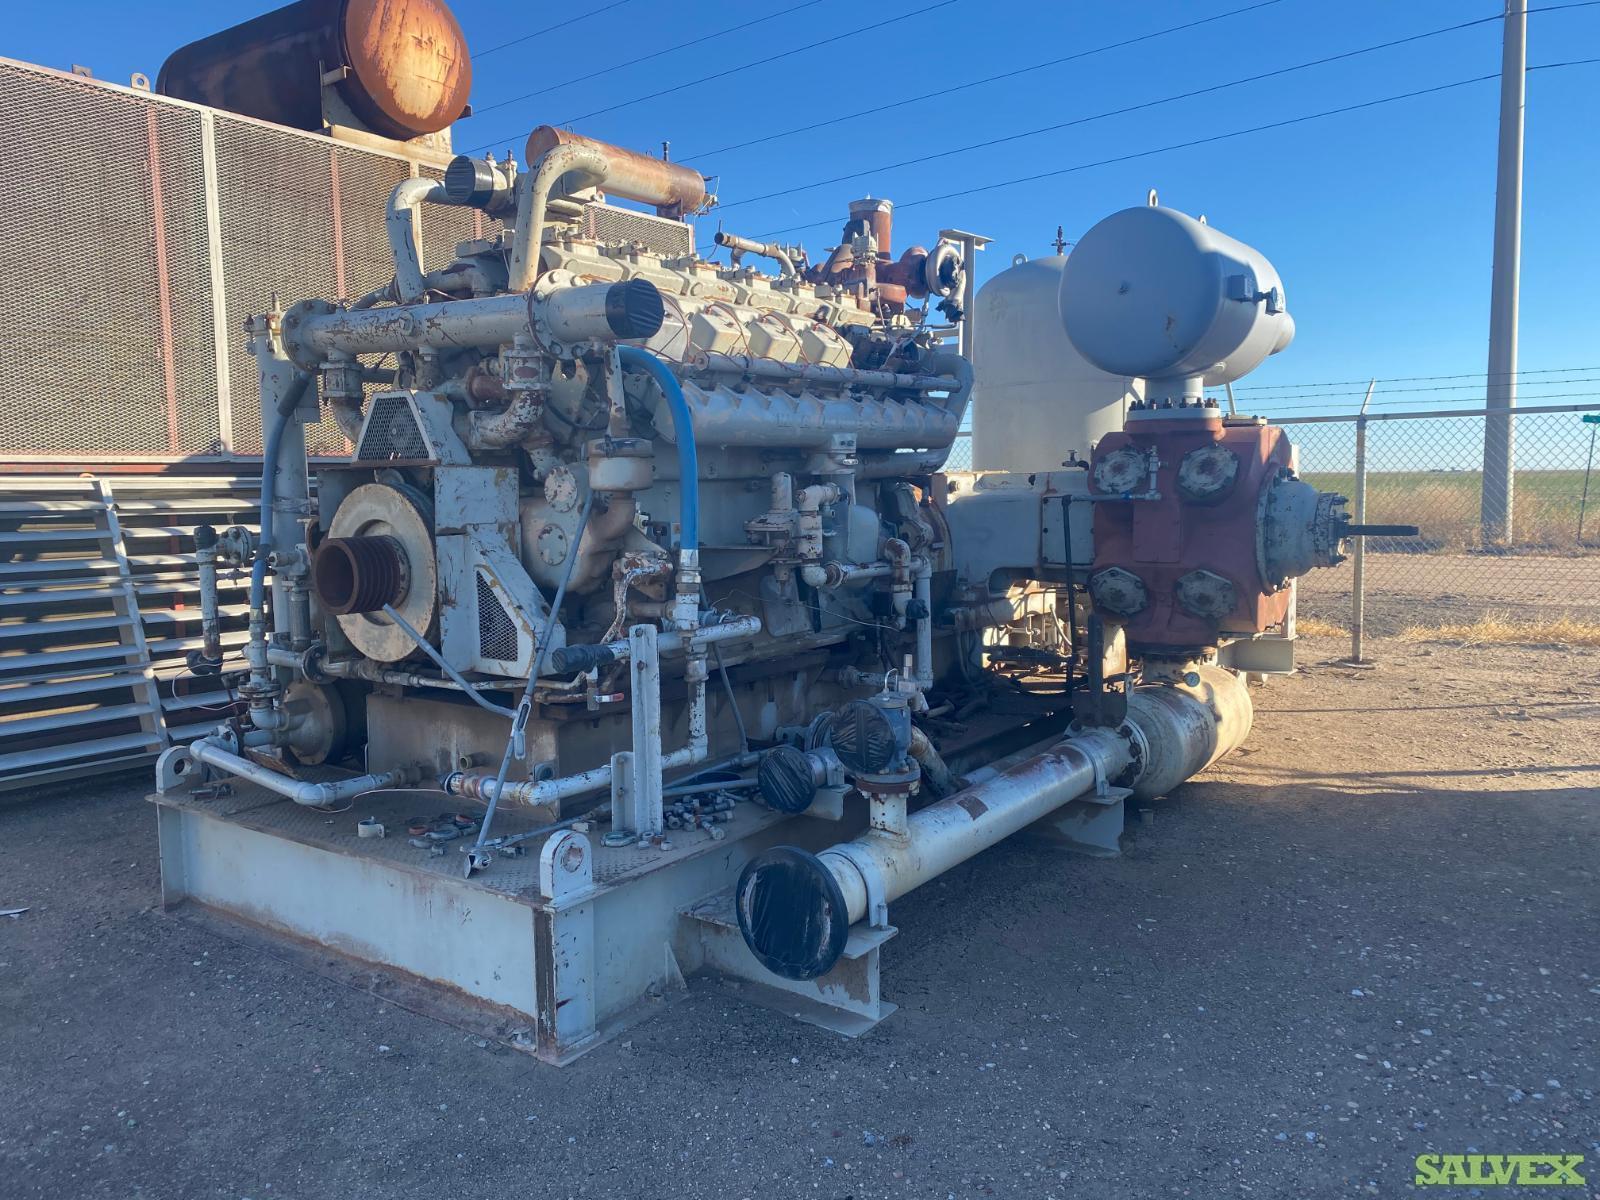 Waukesha Compressor Skids C-YRH-223 (Overhauled)